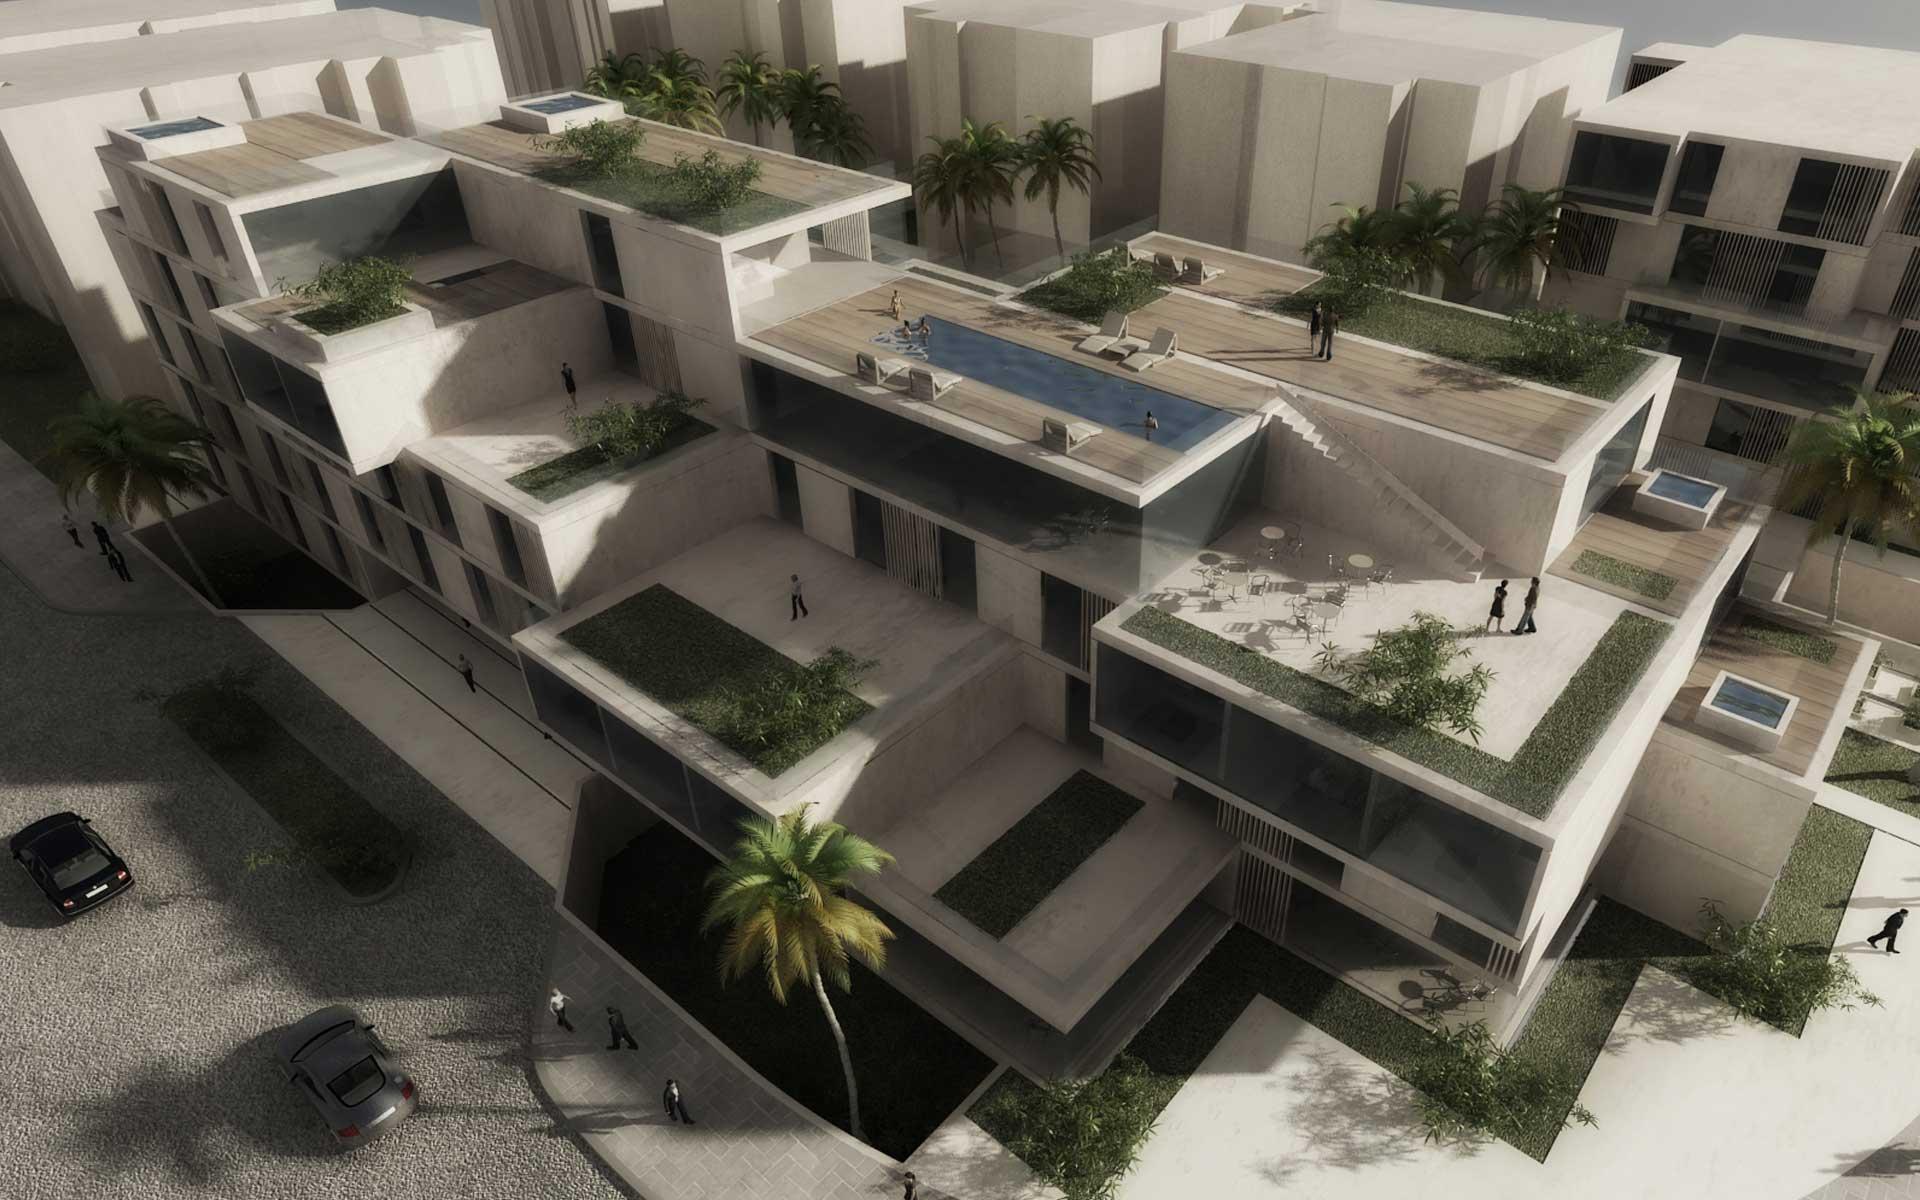 Accent dg specialized architecture lebanon the for Office design lebanon